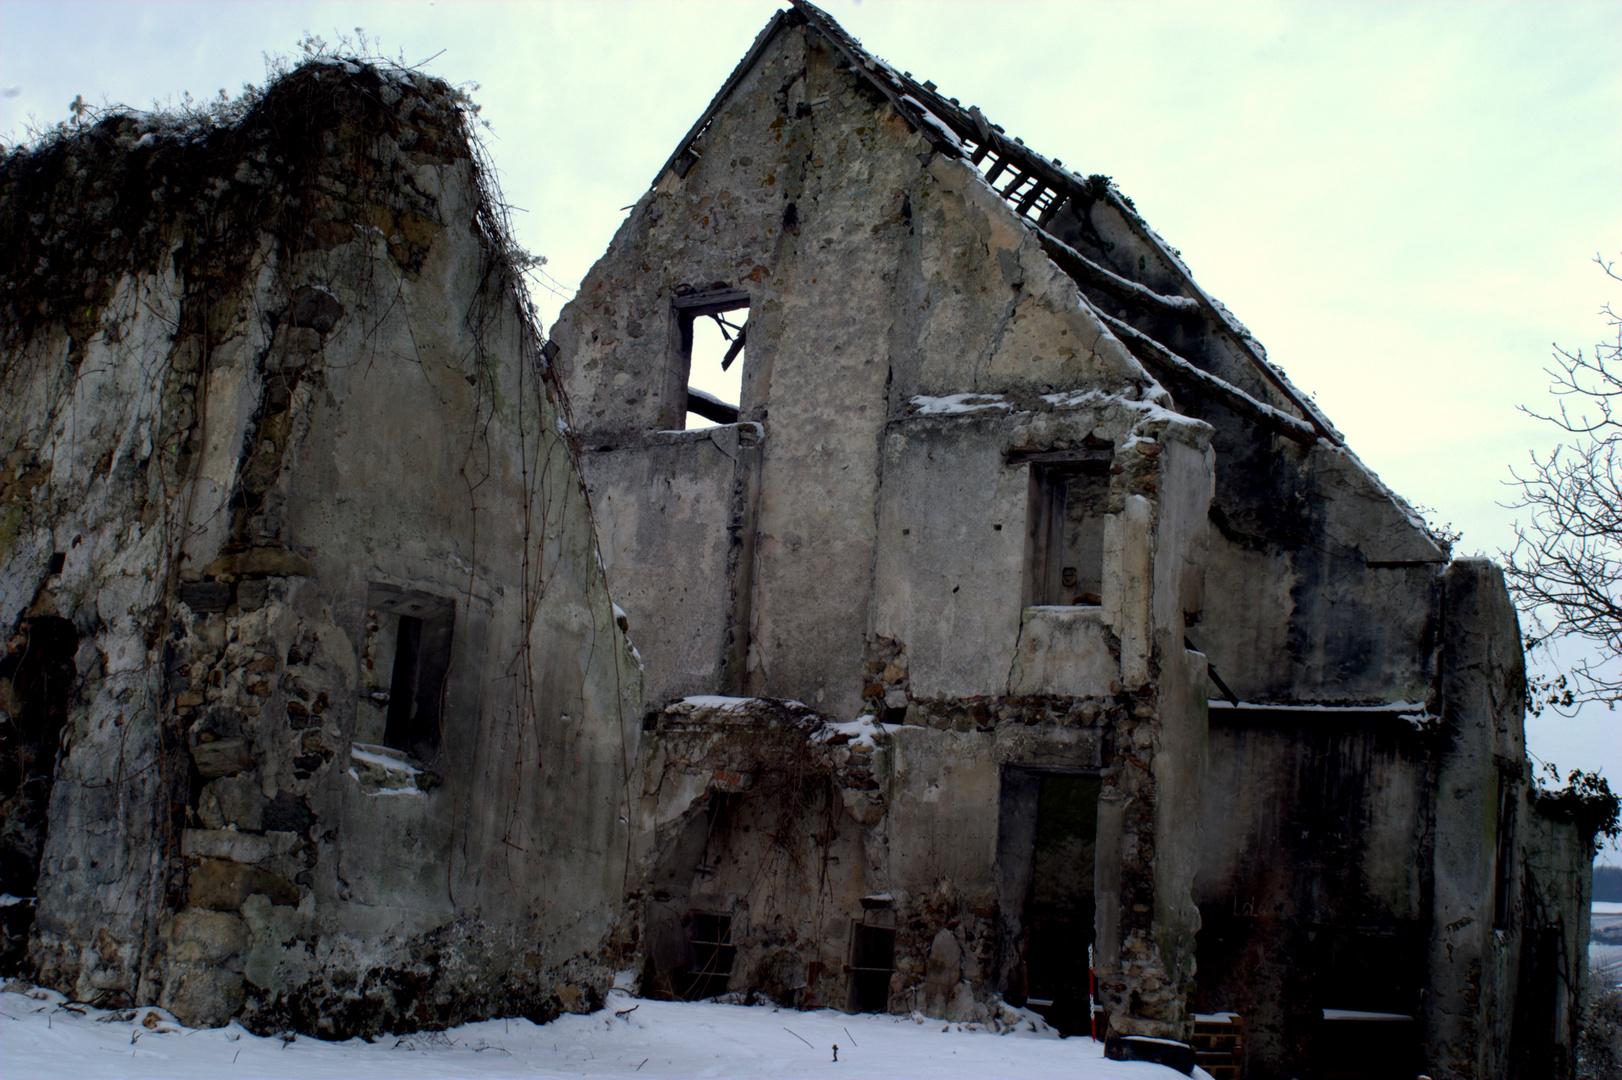 la ruine sans toit